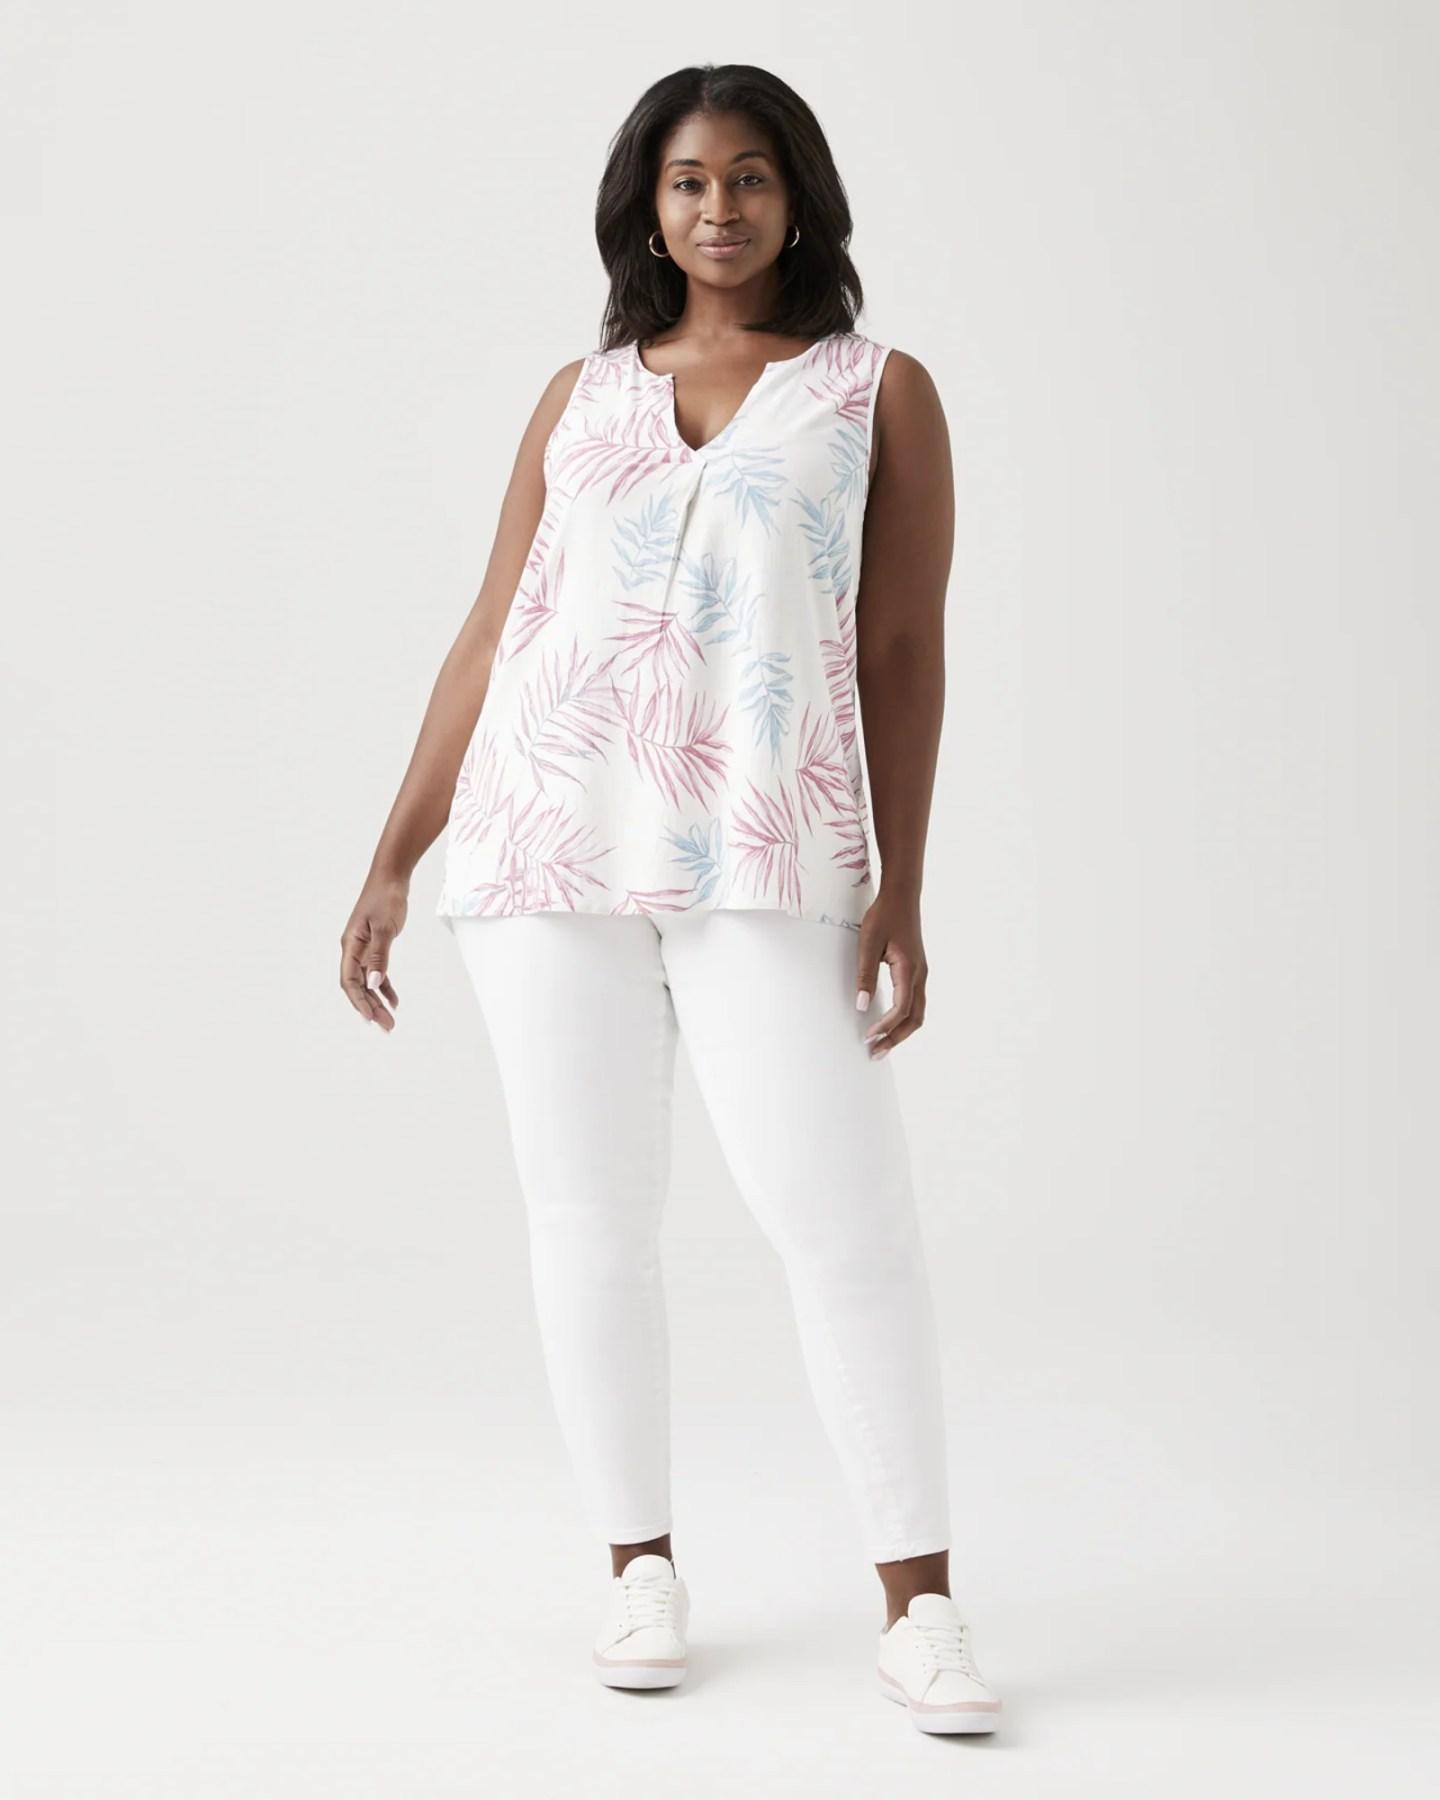 B. Collection Tiffany Sleeveless Blouse - Pink / White, Size 4X (26-28), Dia&Co